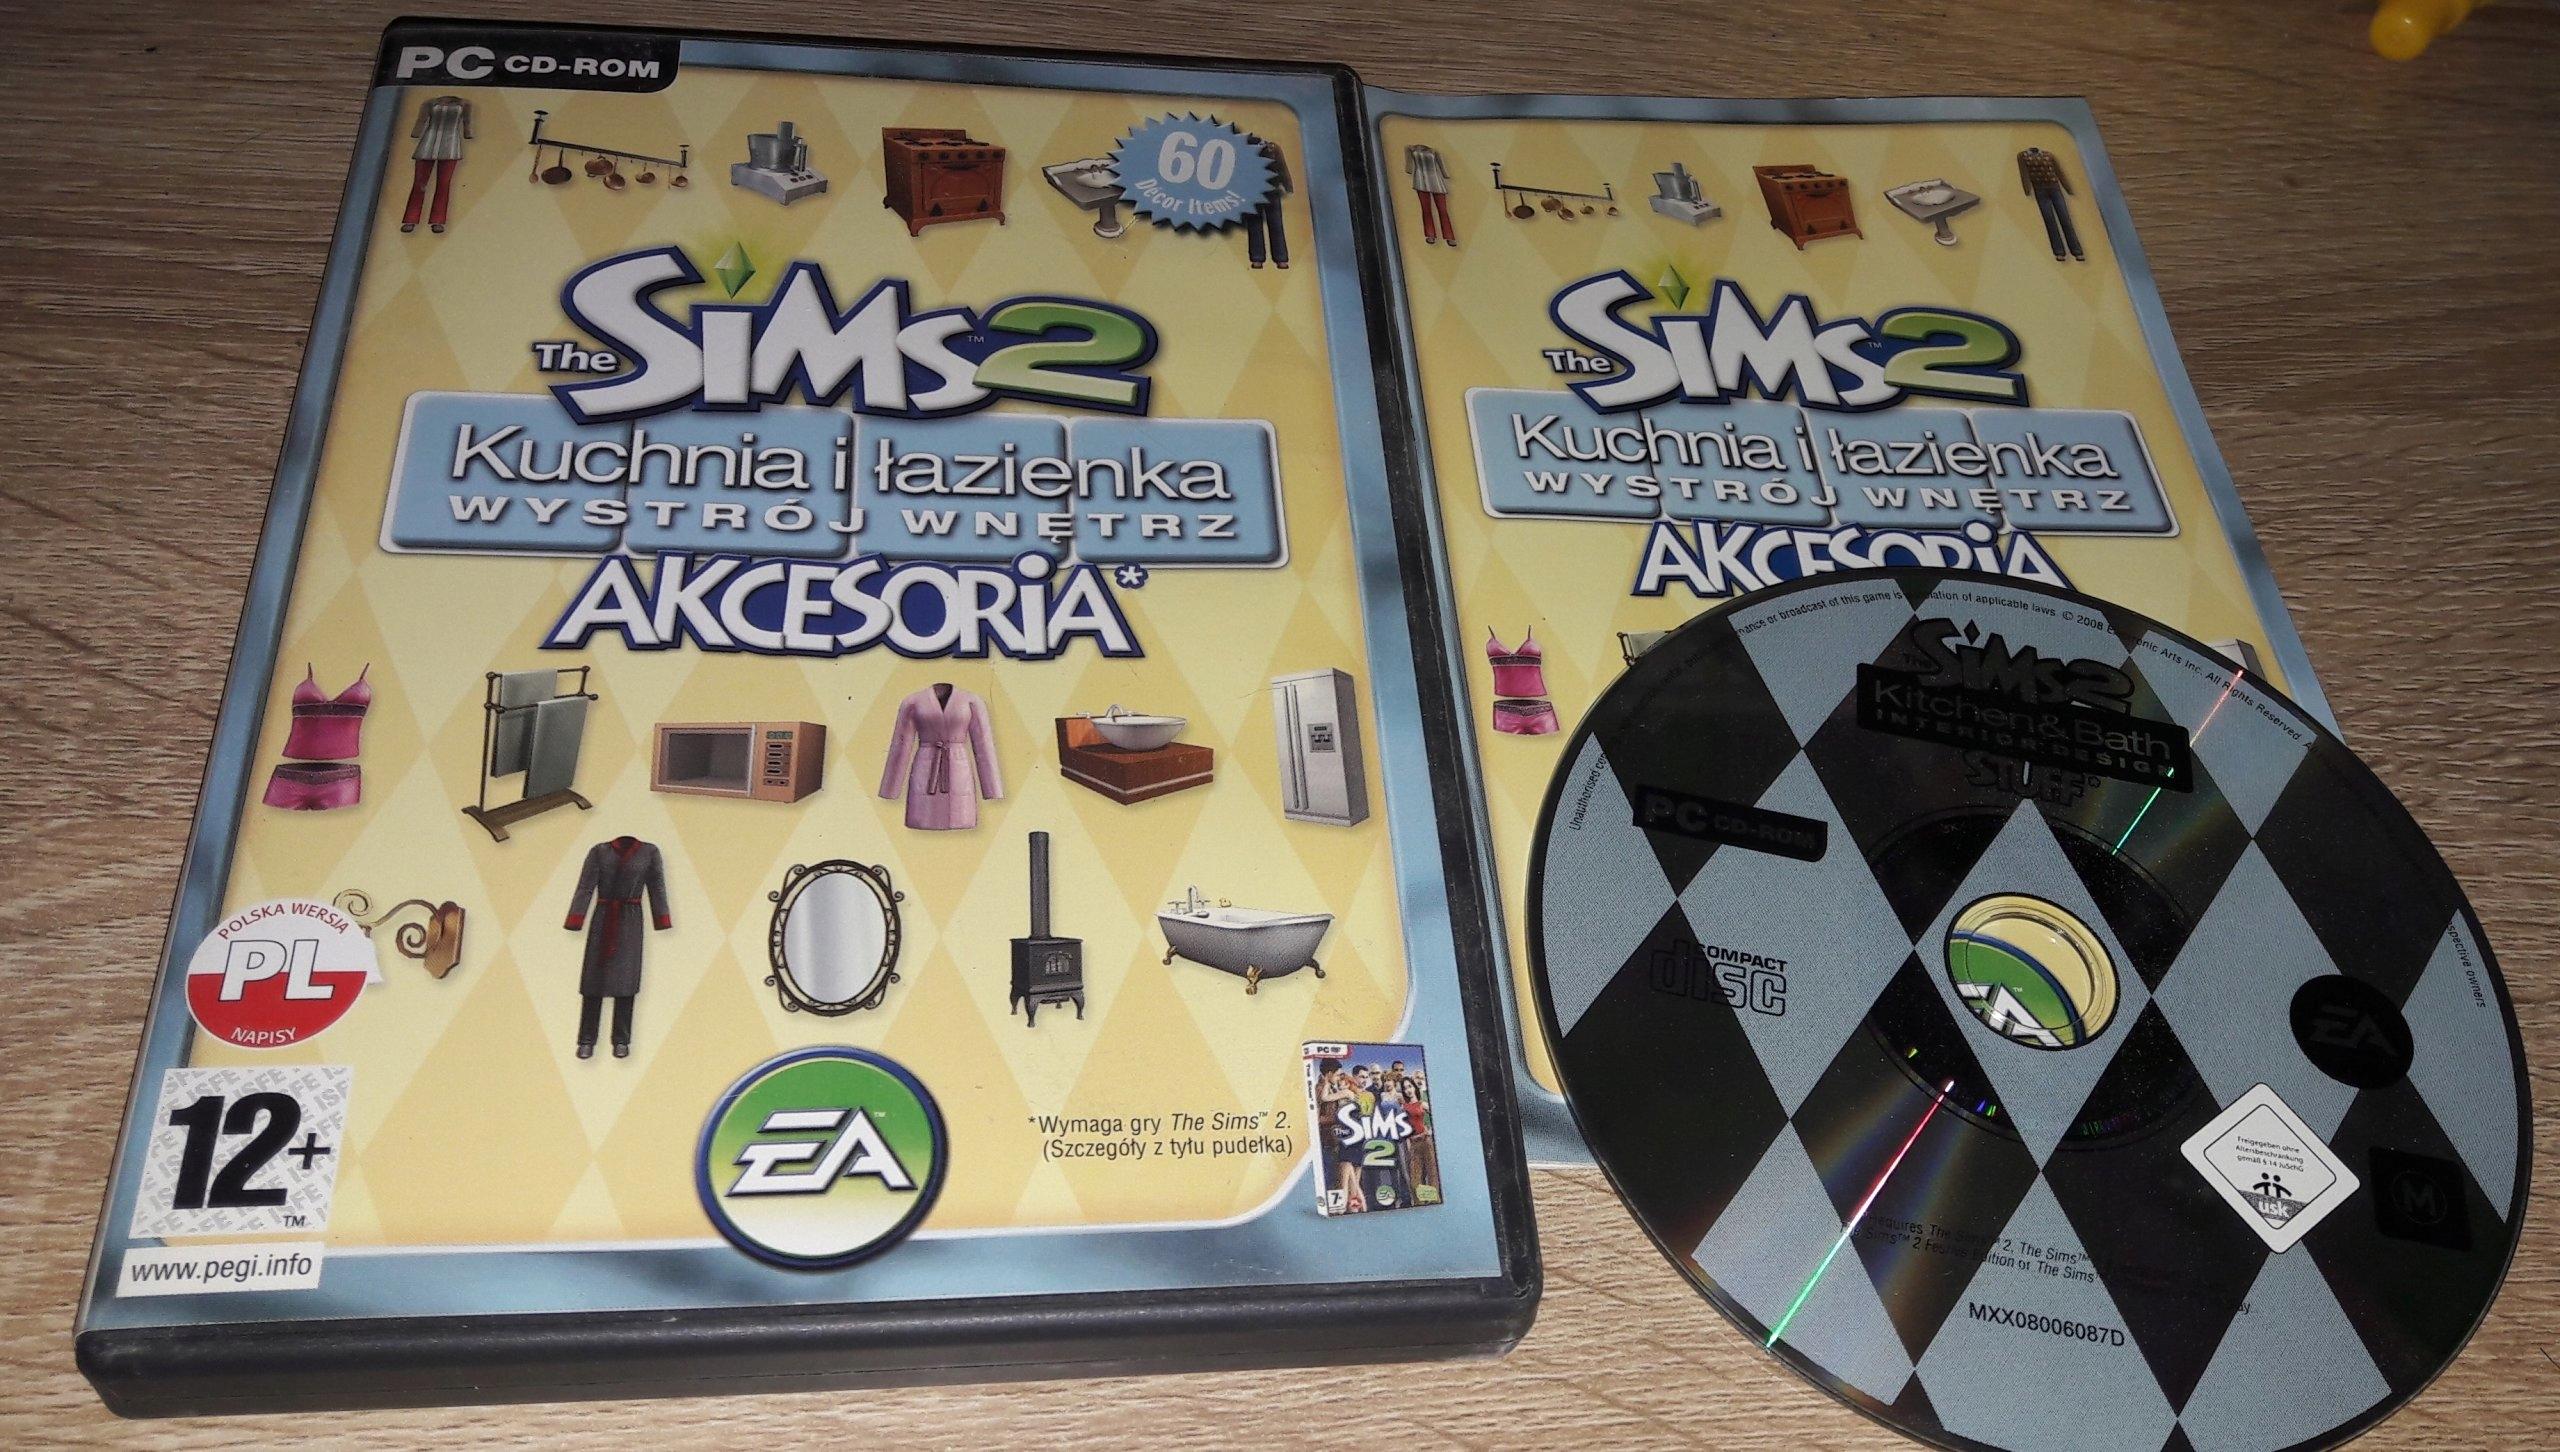 The Sims 2 Kuchnia I łazienka Stan 6 6 7554653024